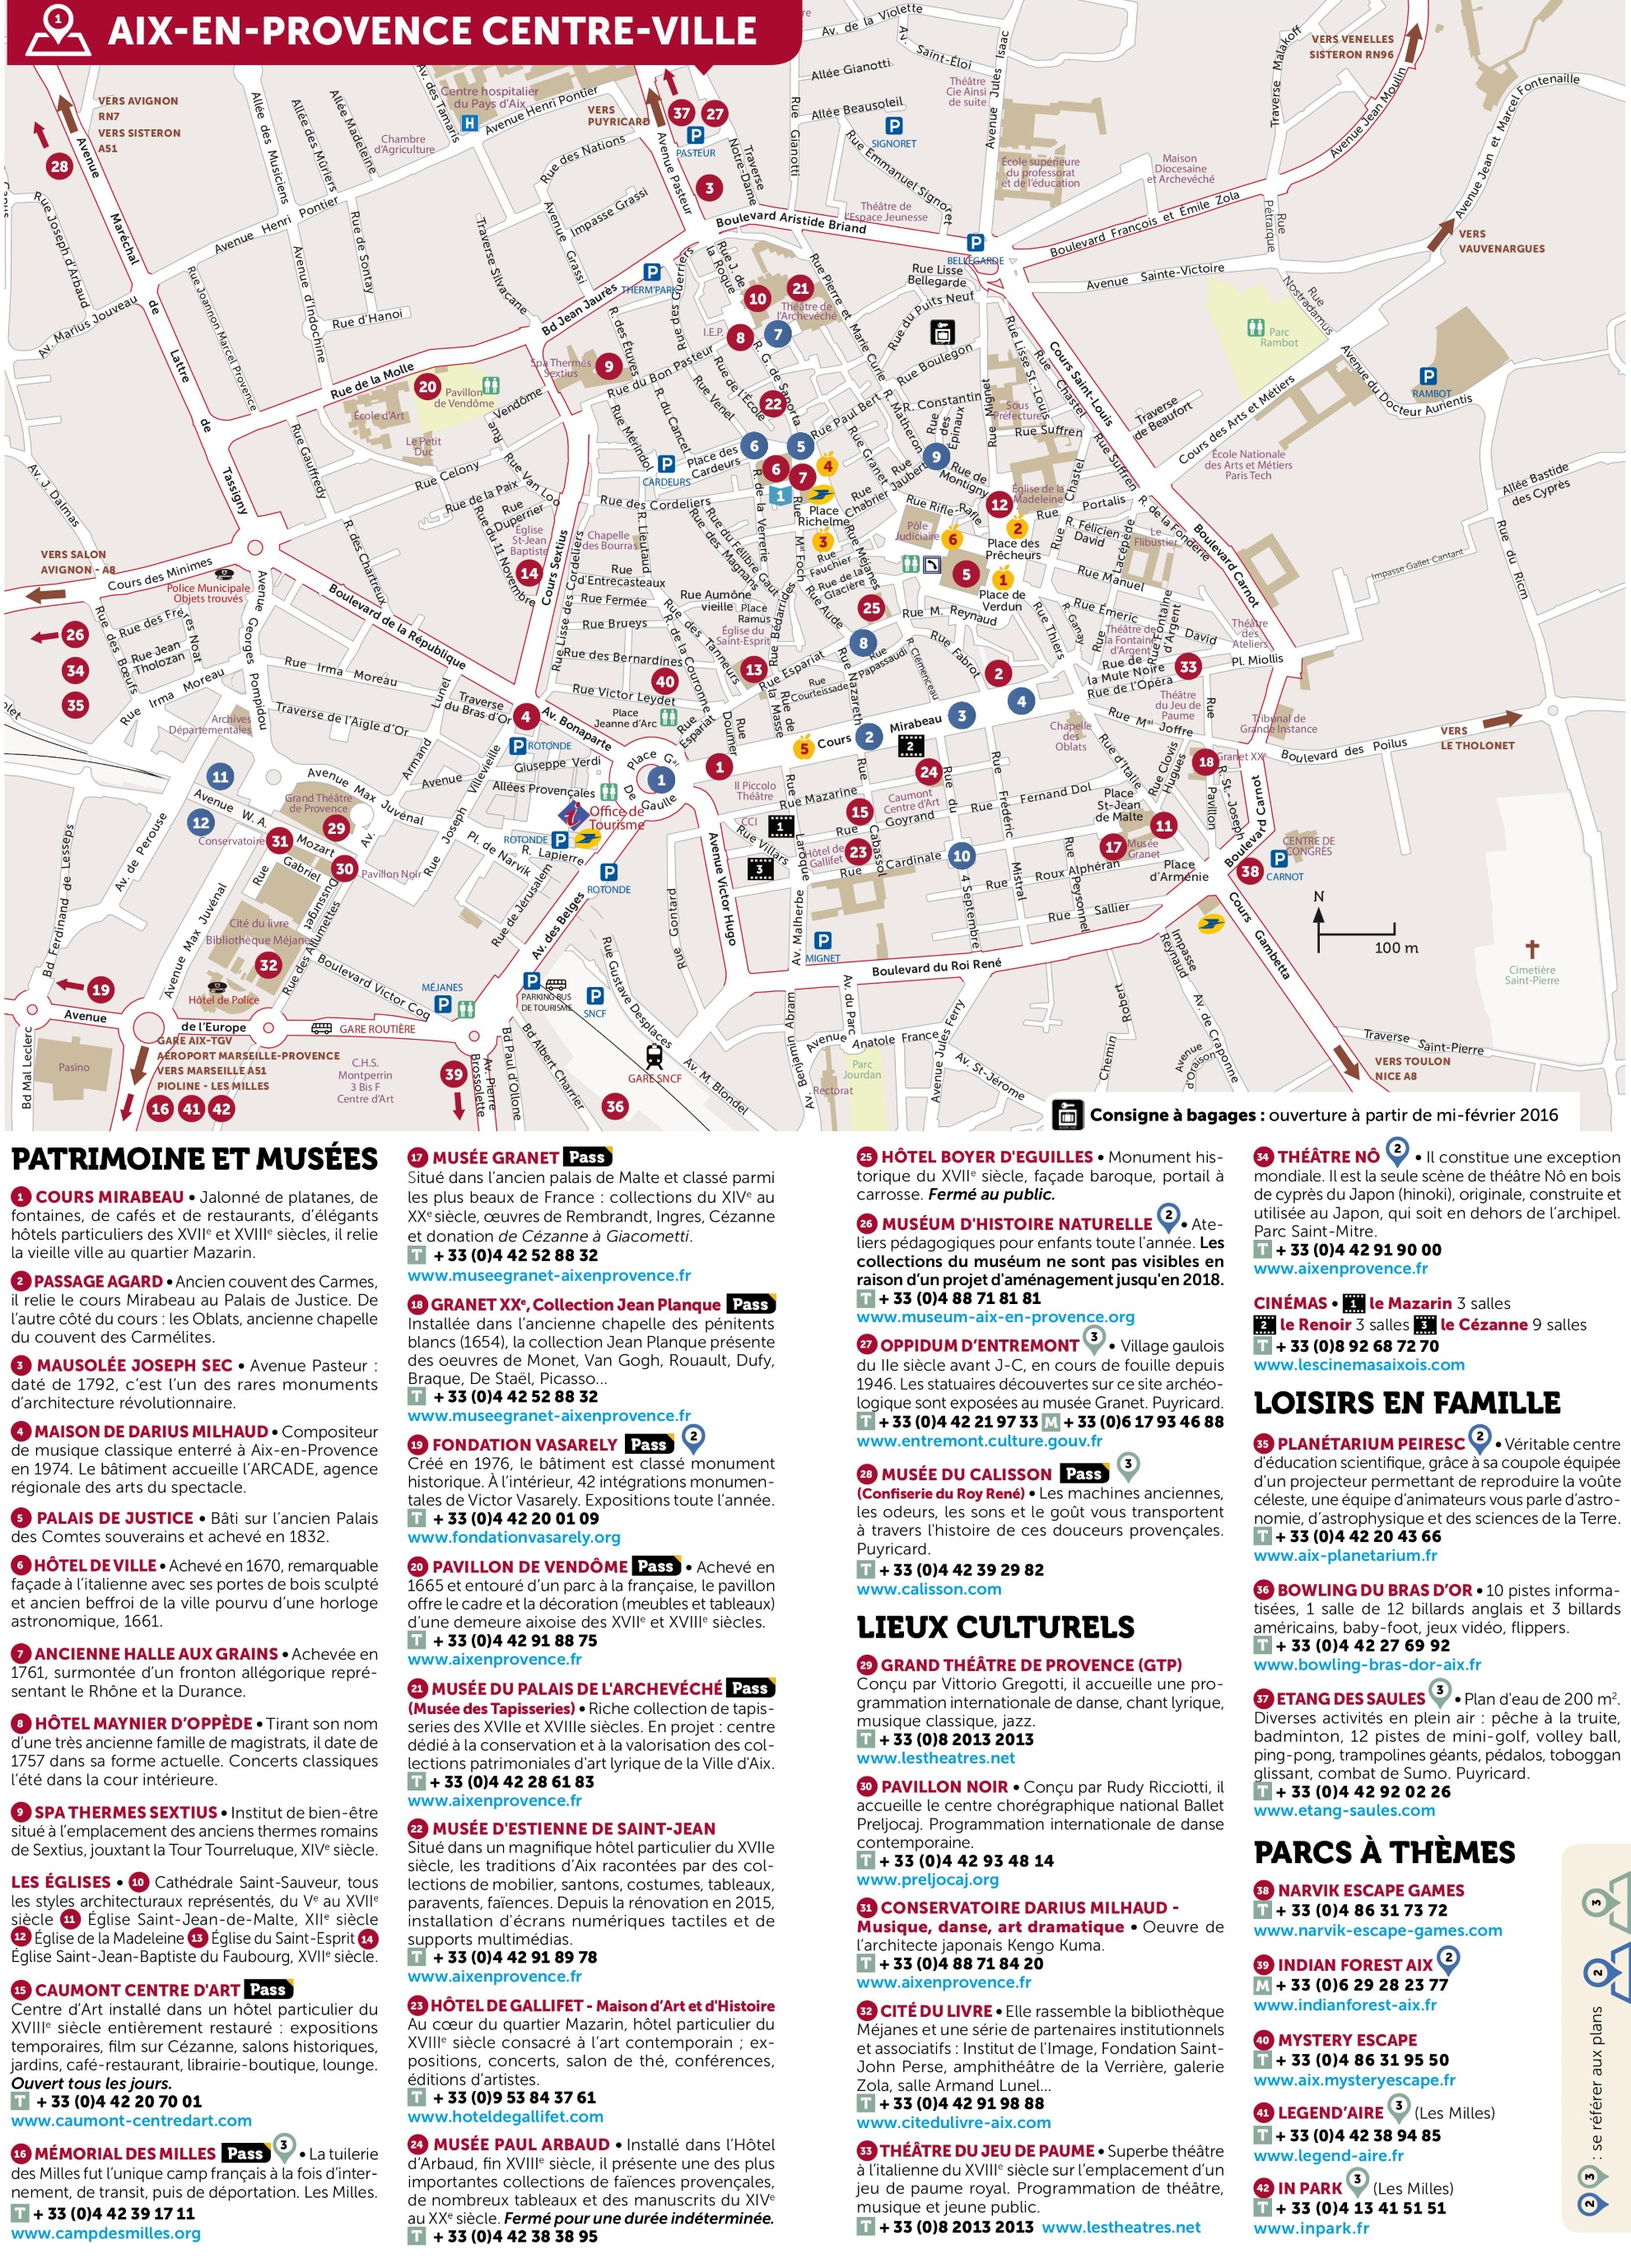 AixenProvence city center map